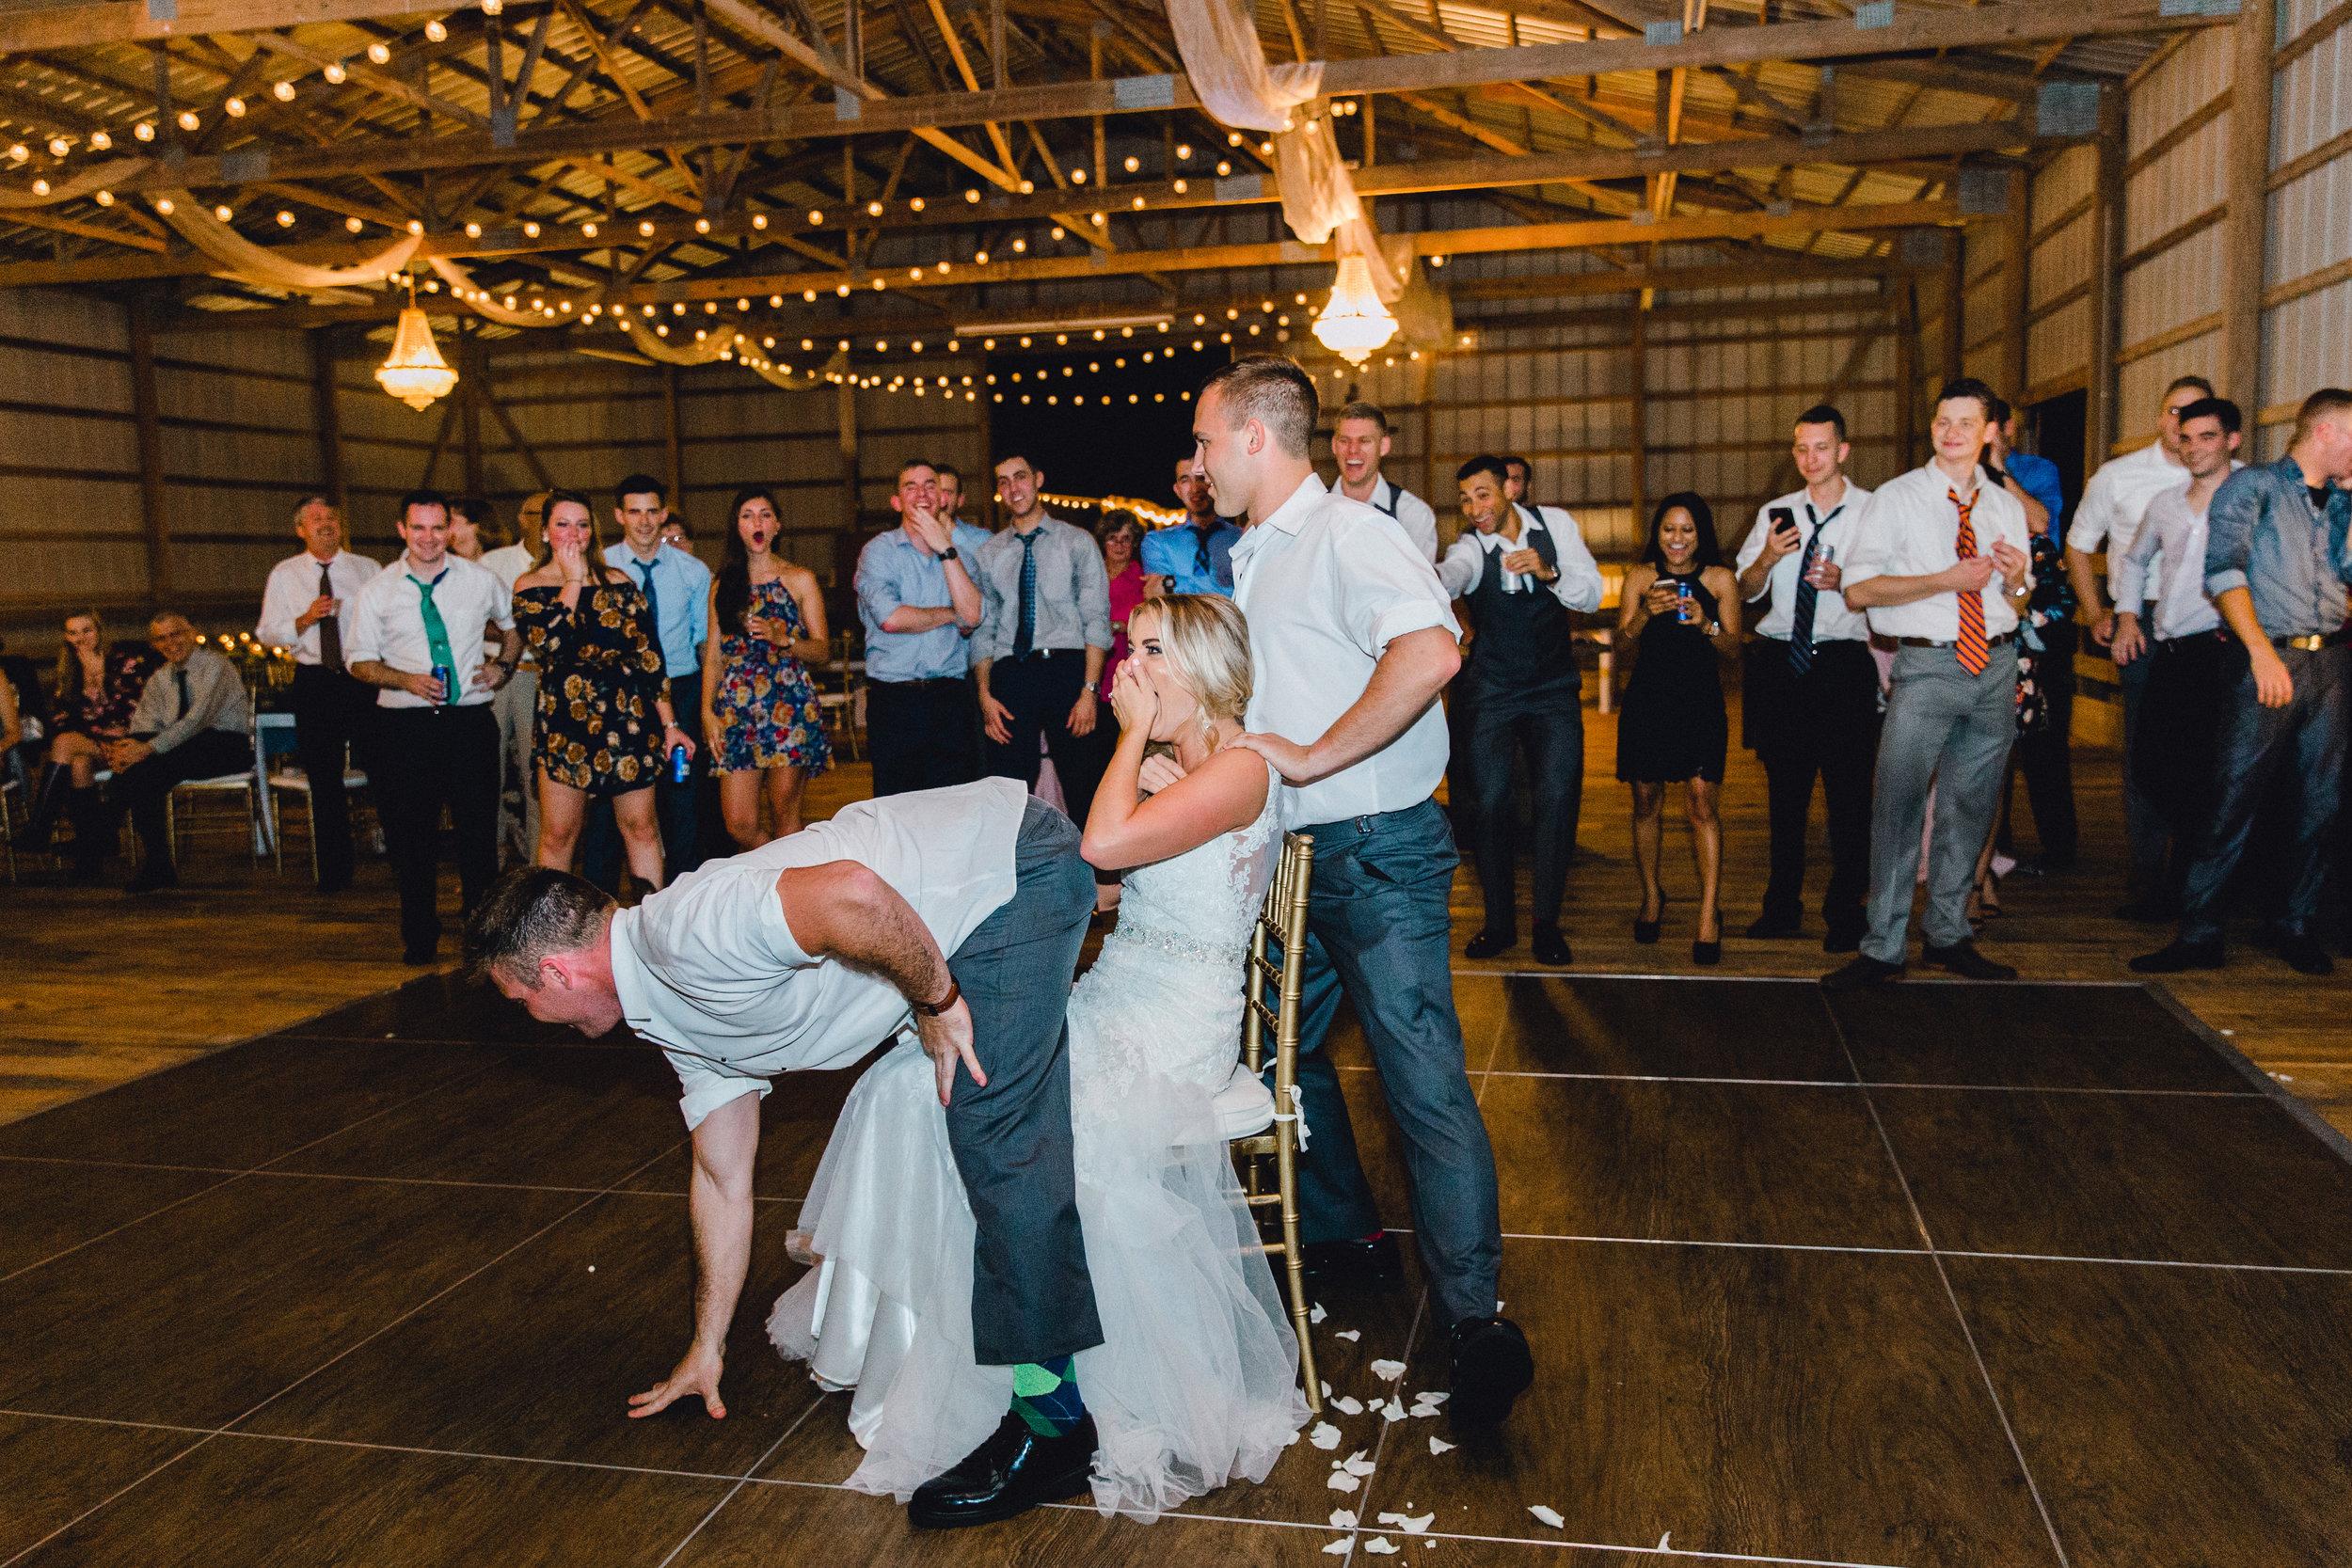 Paige-Mercer-Photography-Florida-Wedding-Photographer-Alyssa&Drew-103.jpg